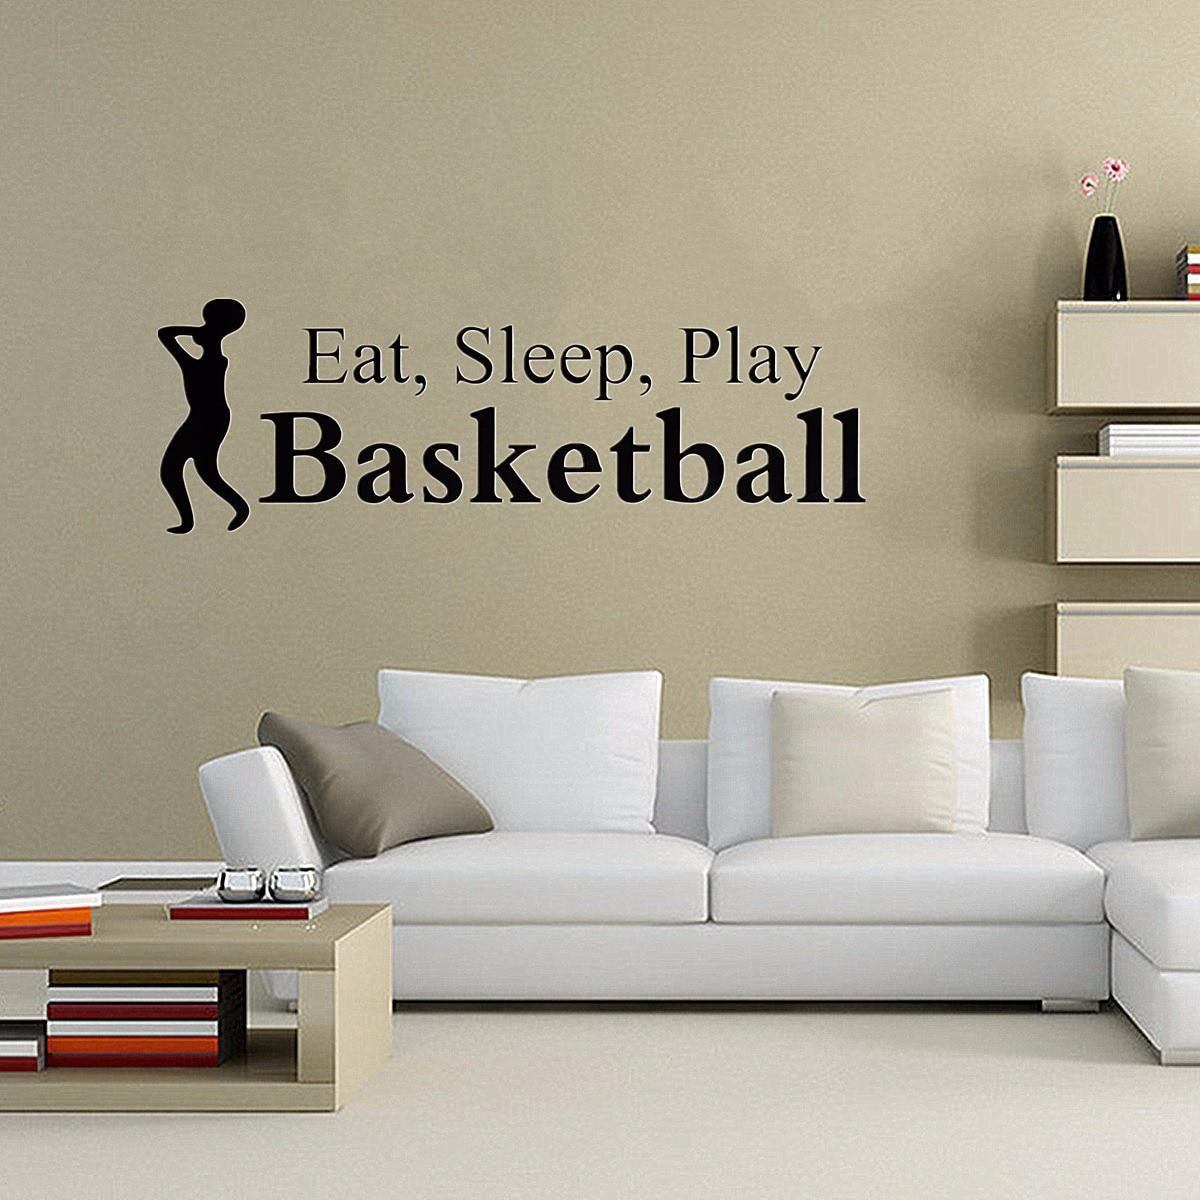 Eat Sleep Play Basketball Wall Sticker Boy Room Bedroom Home Decor Mural PVC Sticker Exquisite Art Deco Wall Sticker